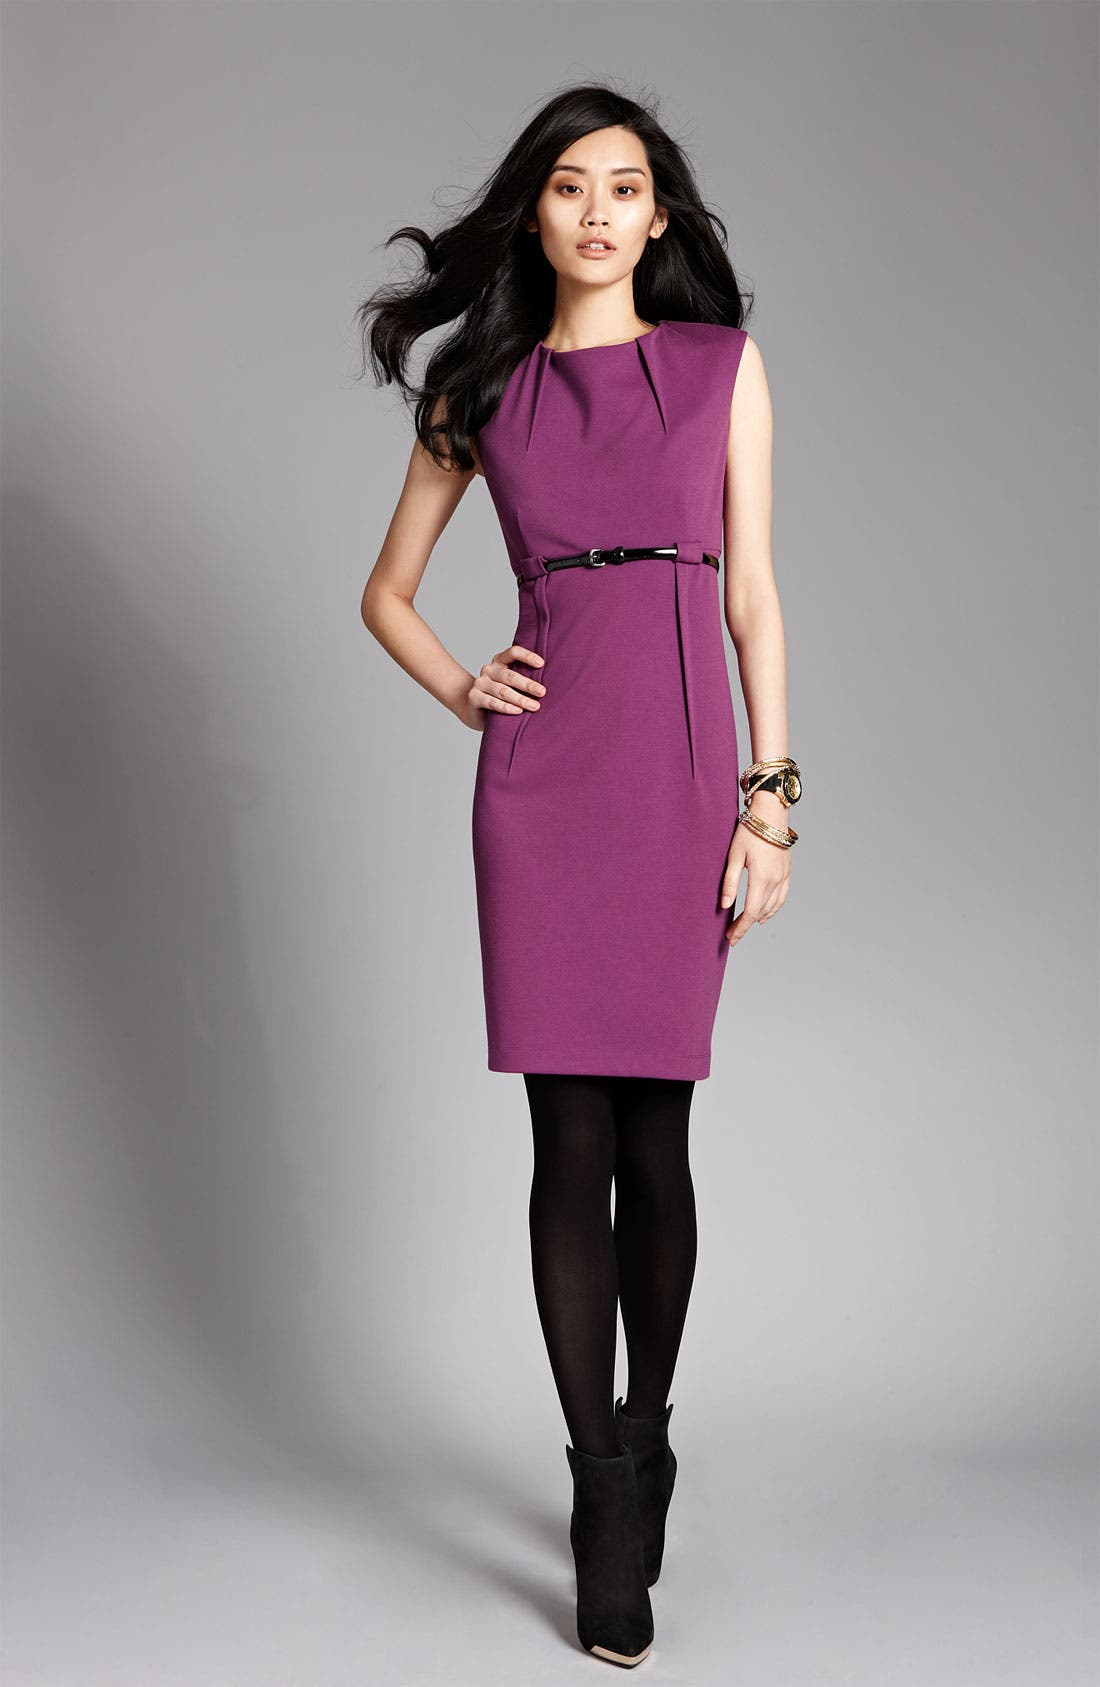 Alternate Image 1 Selected - Calvin Klein Dress & Accessories